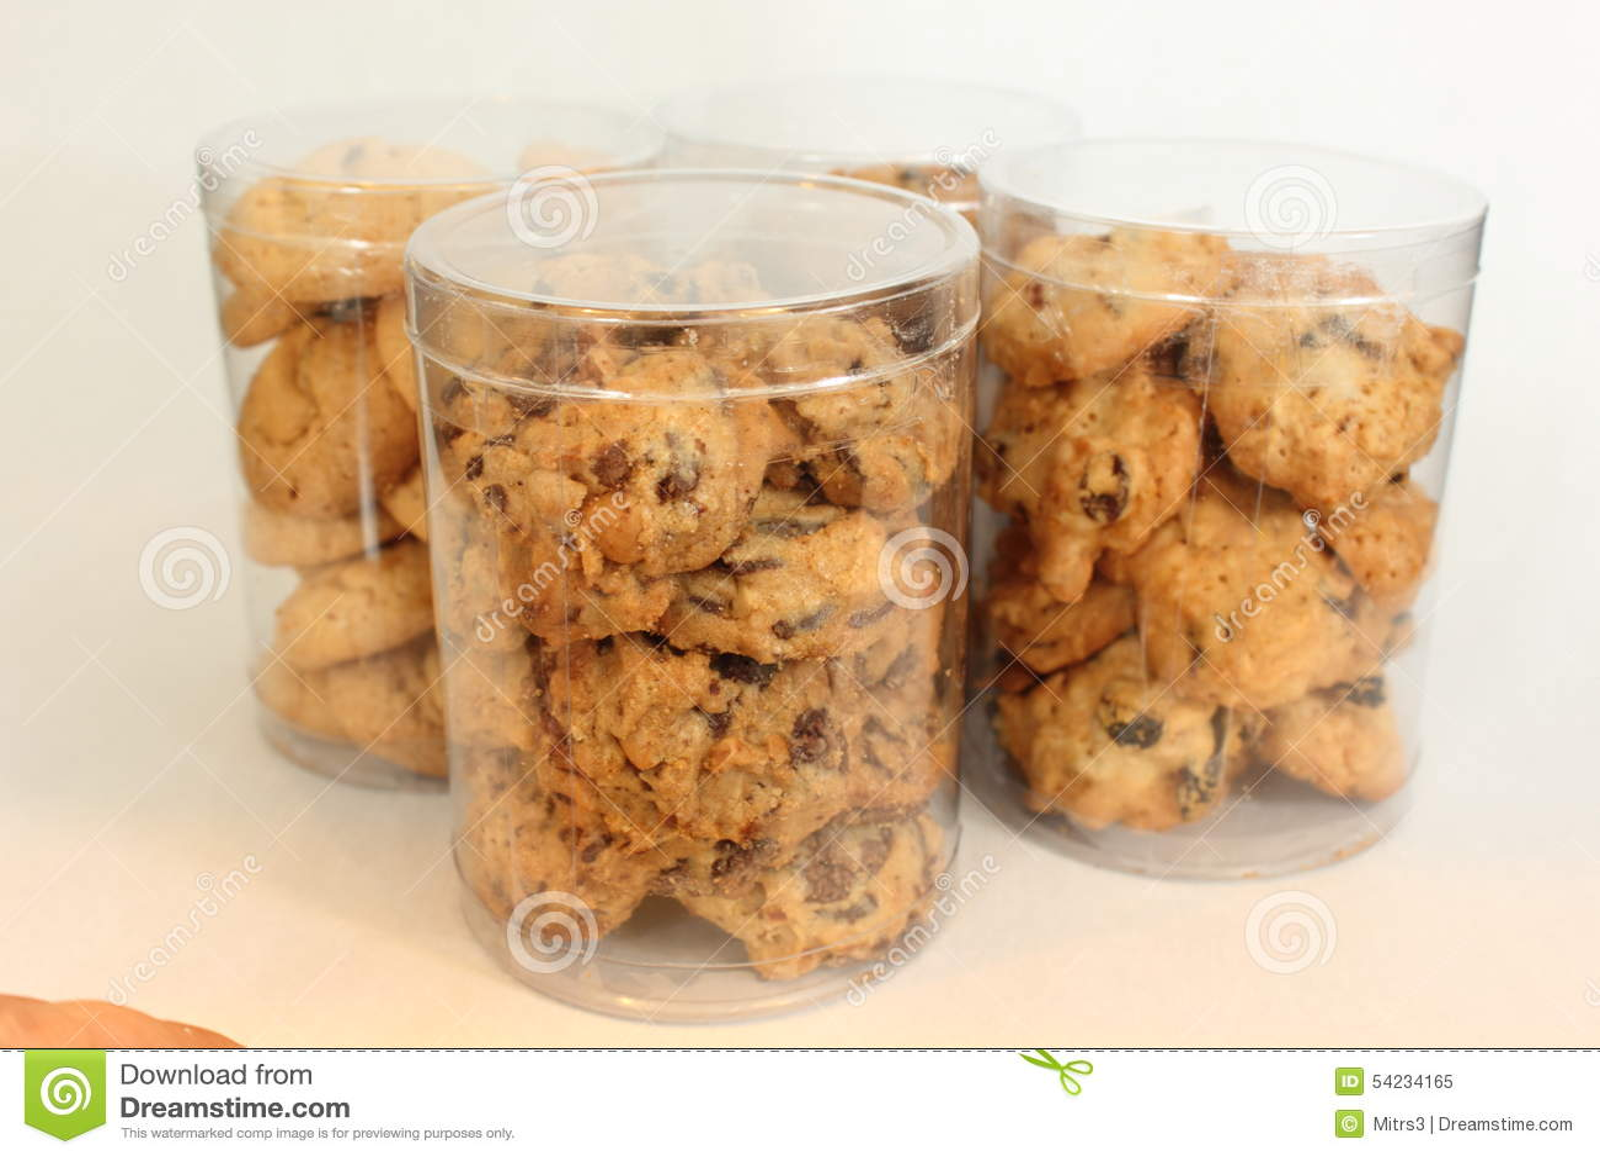 Cookie In Plastic Box , On White, Studio Shot. Stock Image